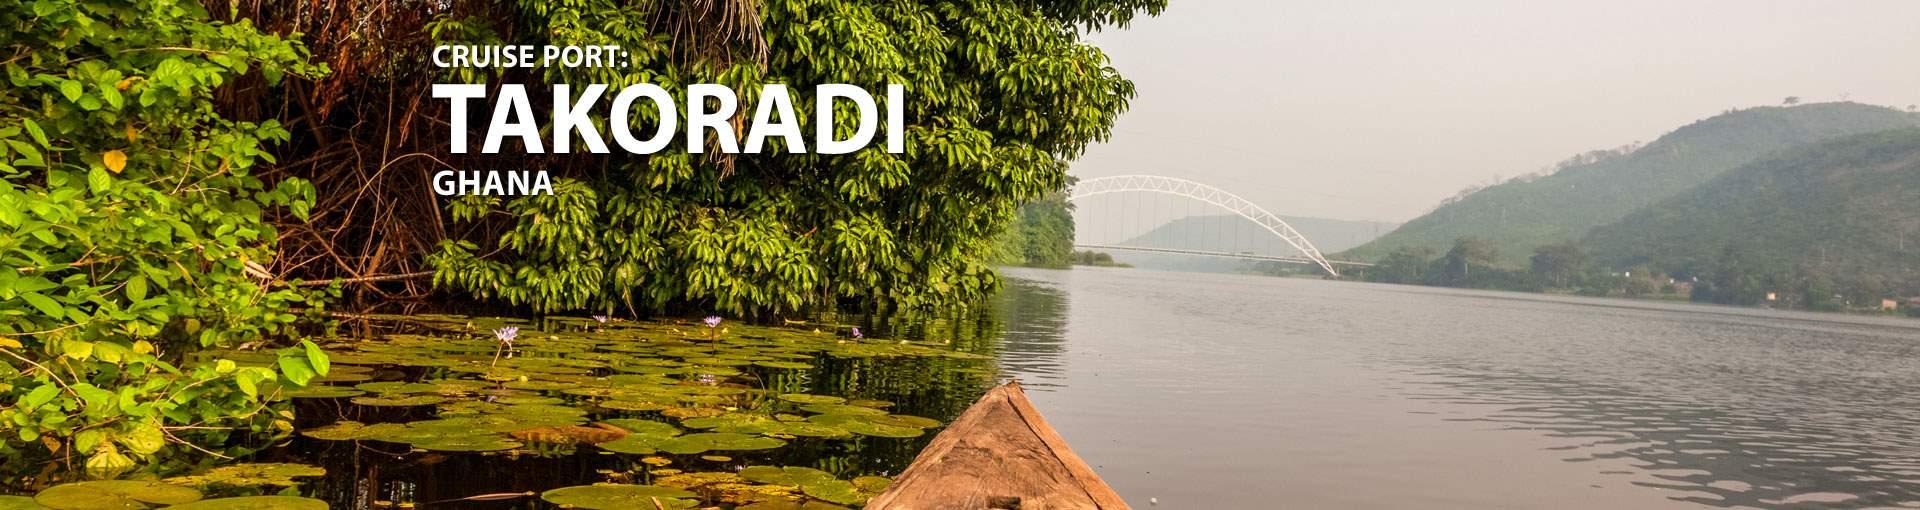 Cruises to Takoradi, Ghana